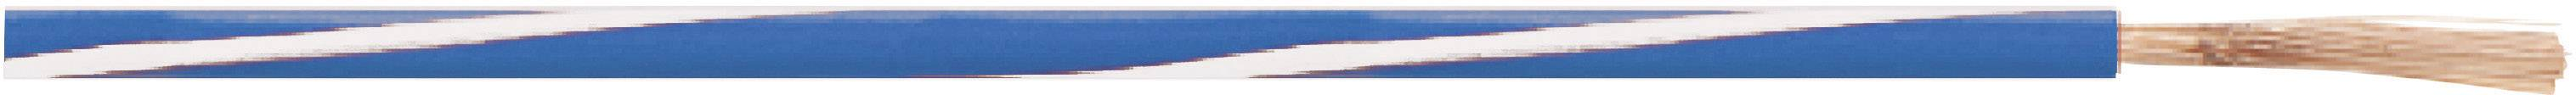 Opletenie / lanko LappKabel 4512323S X05V-K, 1 x 1 mm², vonkajší Ø 2.60 mm, metrový tovar, žltá, biela